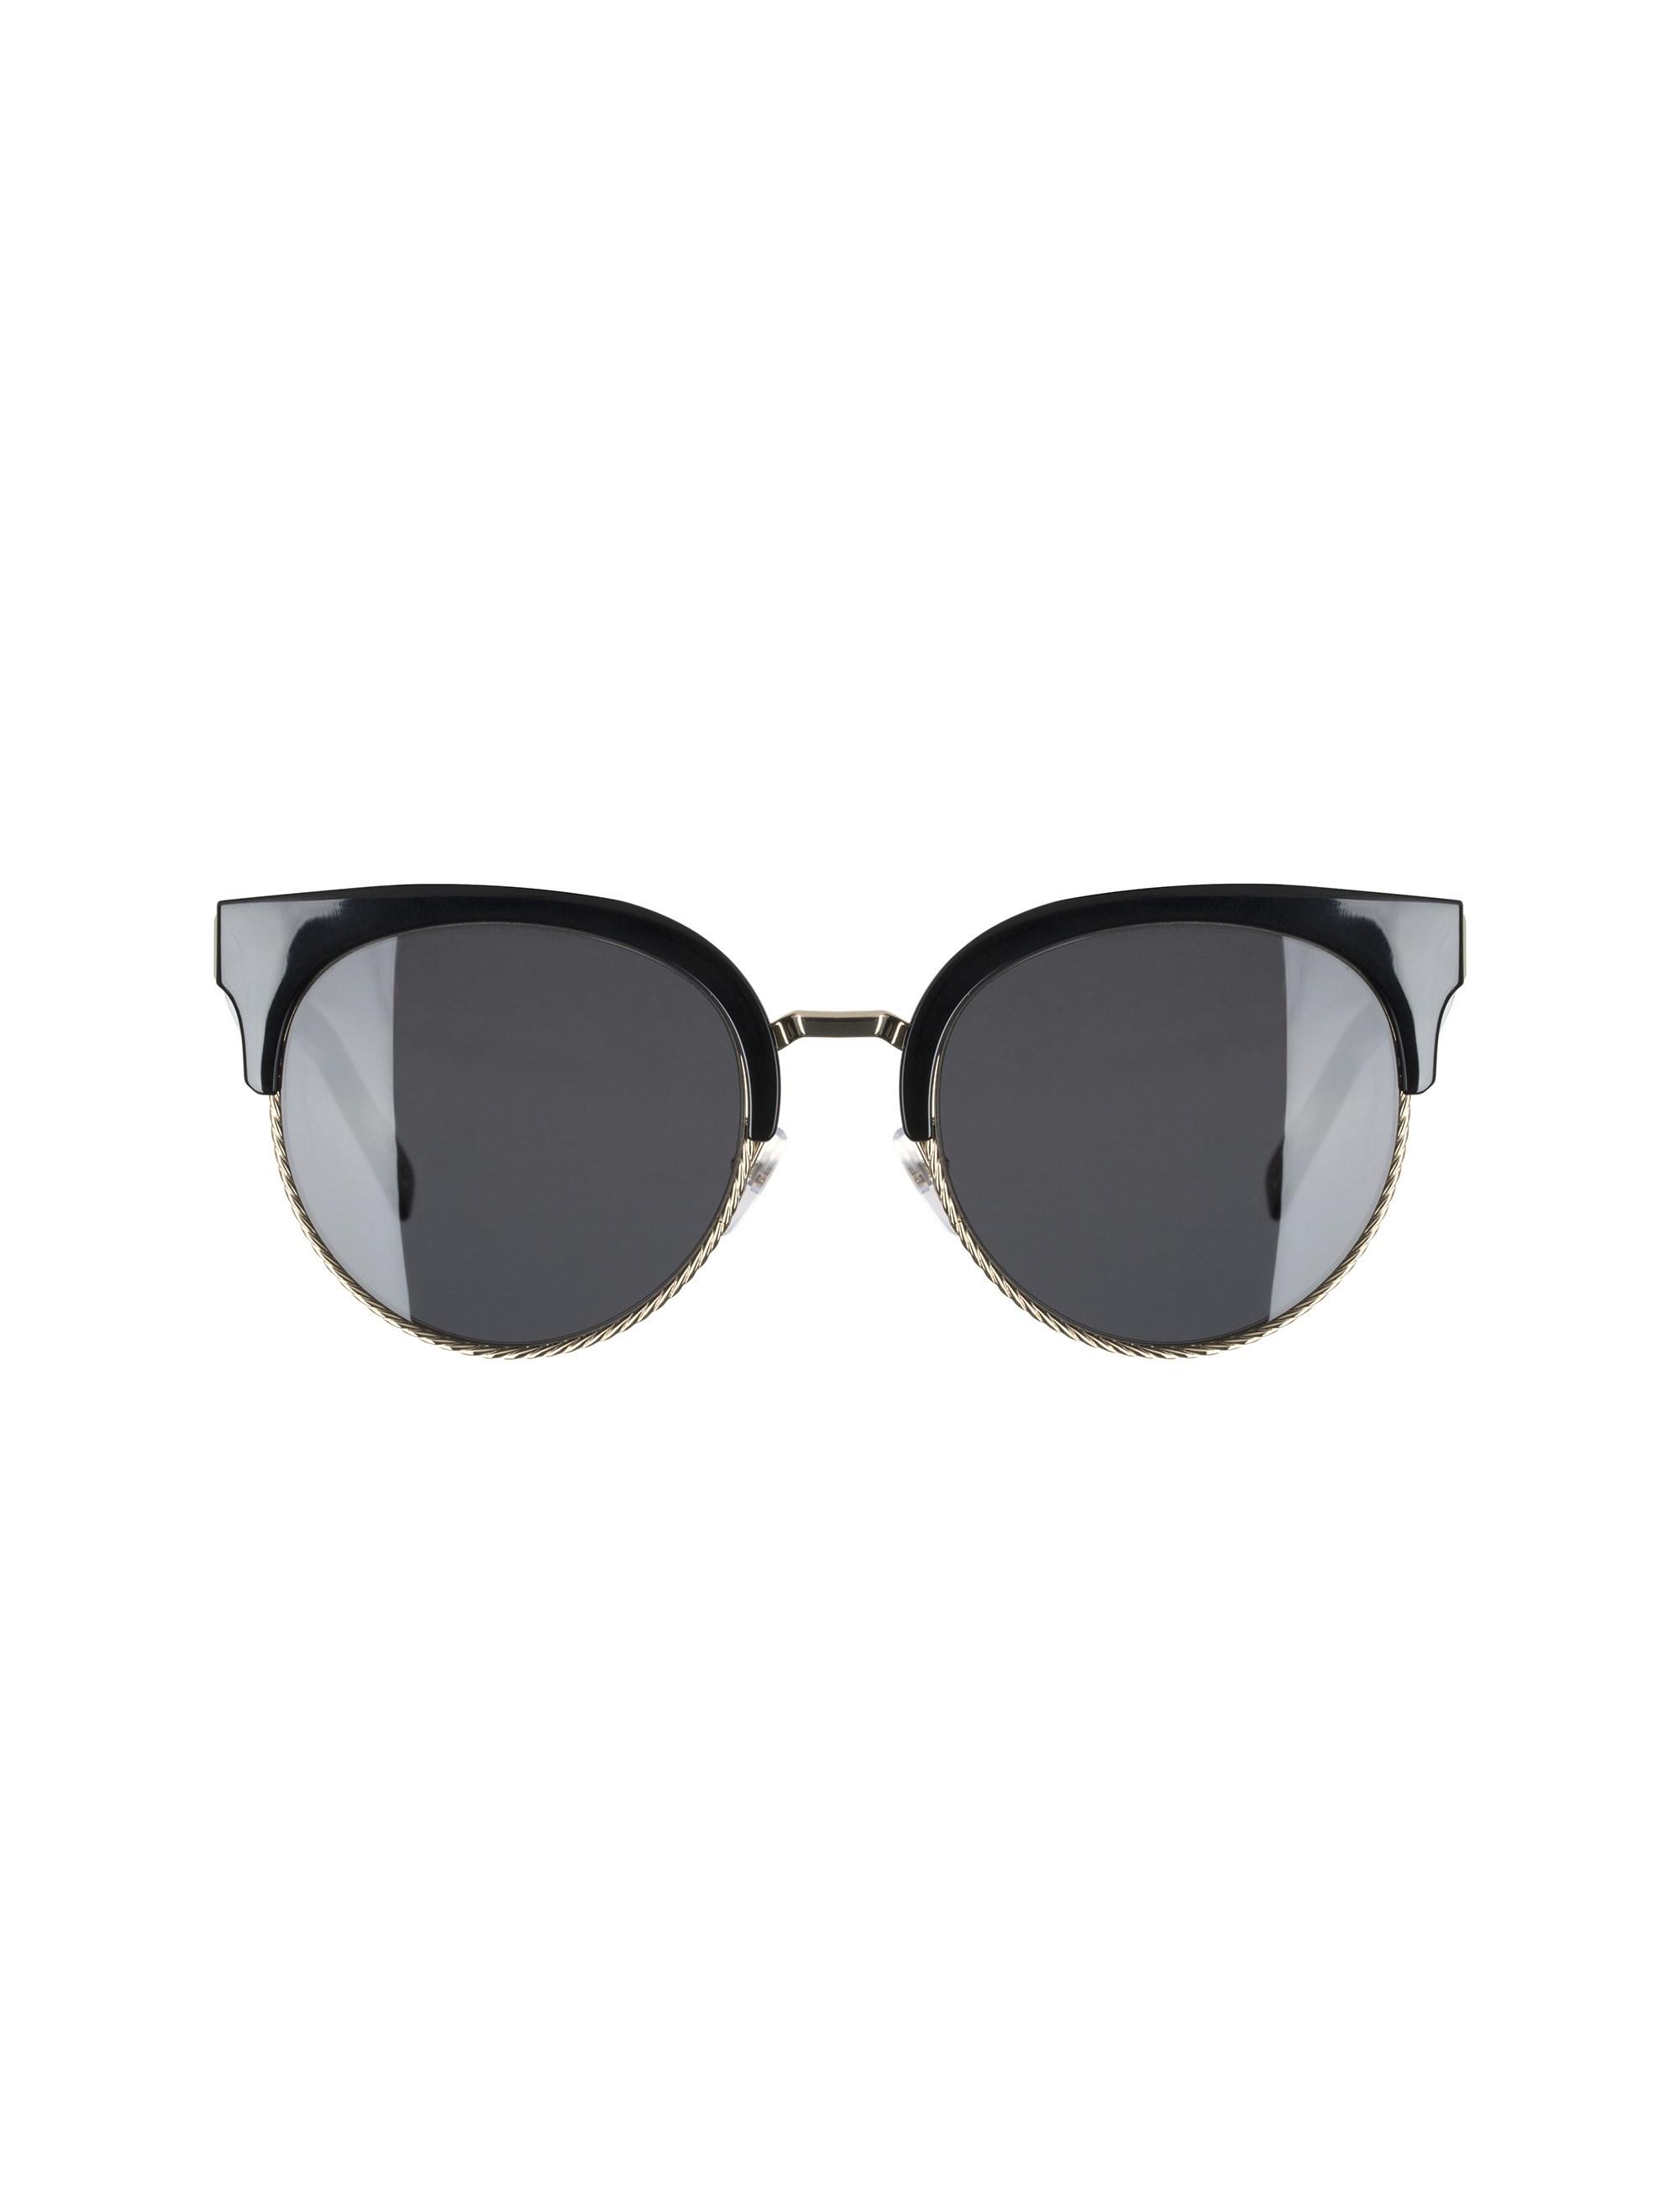 عینک آفتابی کلاب مستر زنانه - مارک جکوبس